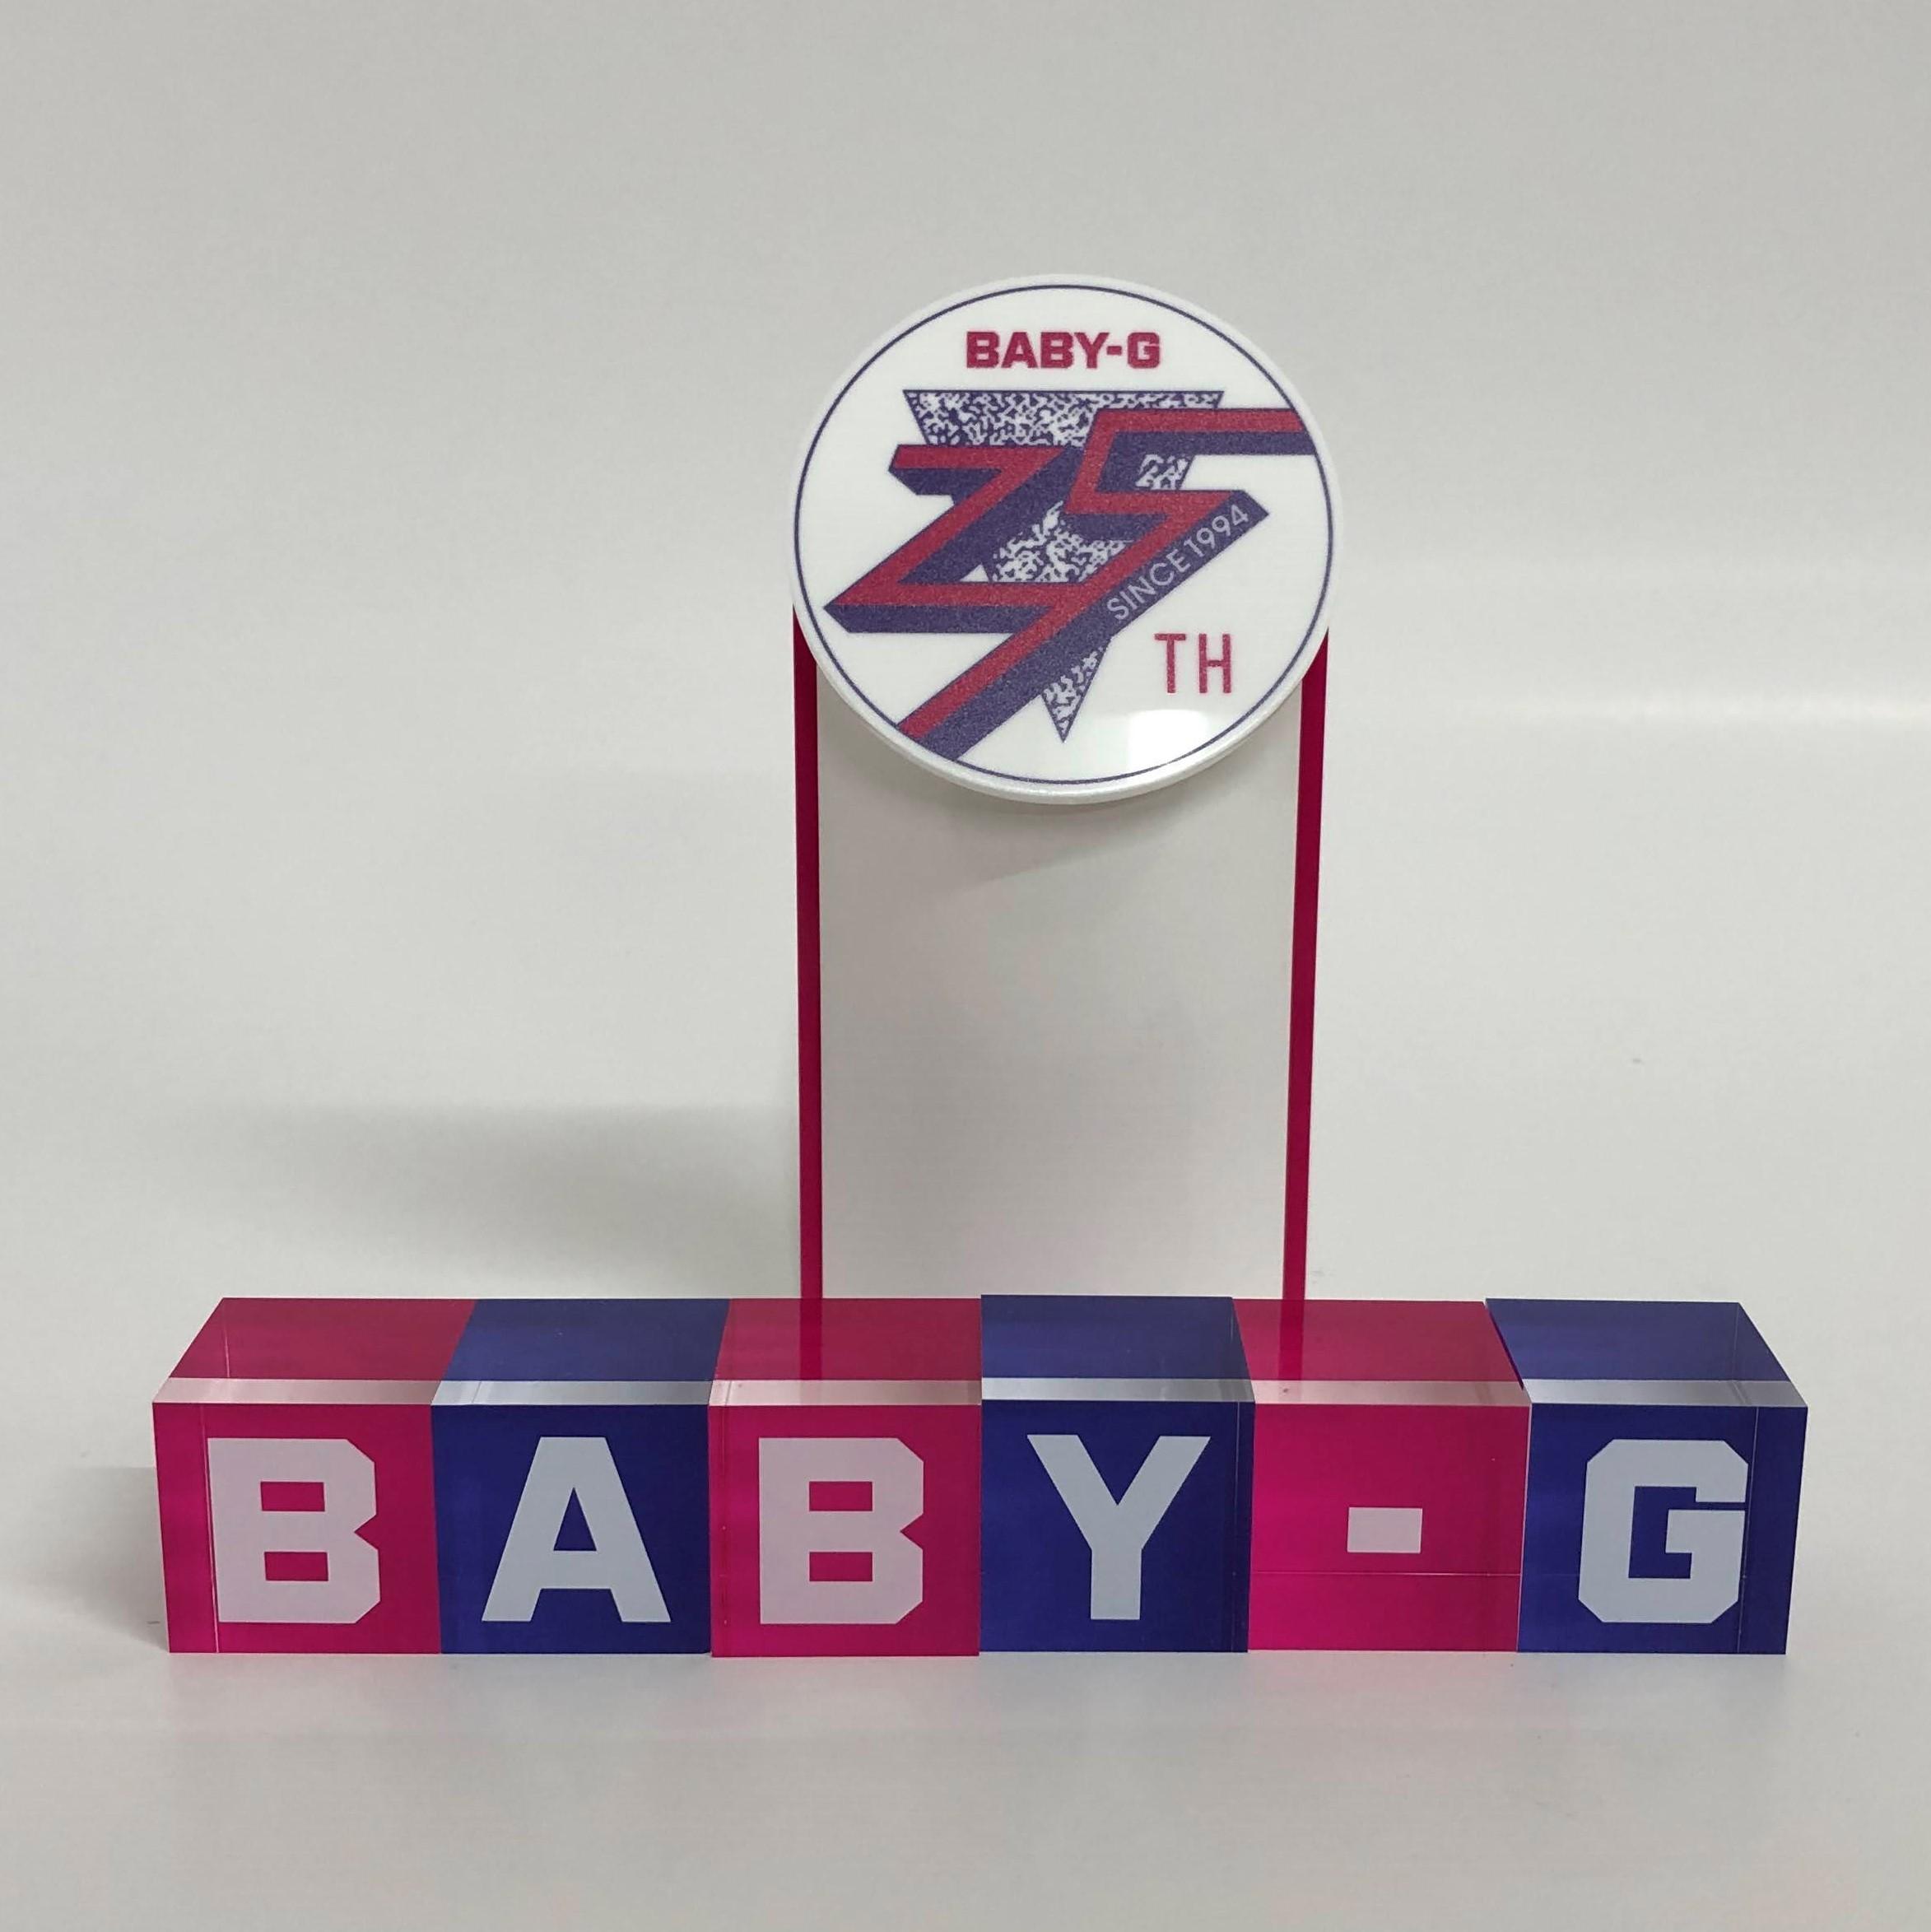 BABY-G 25thツール (2)